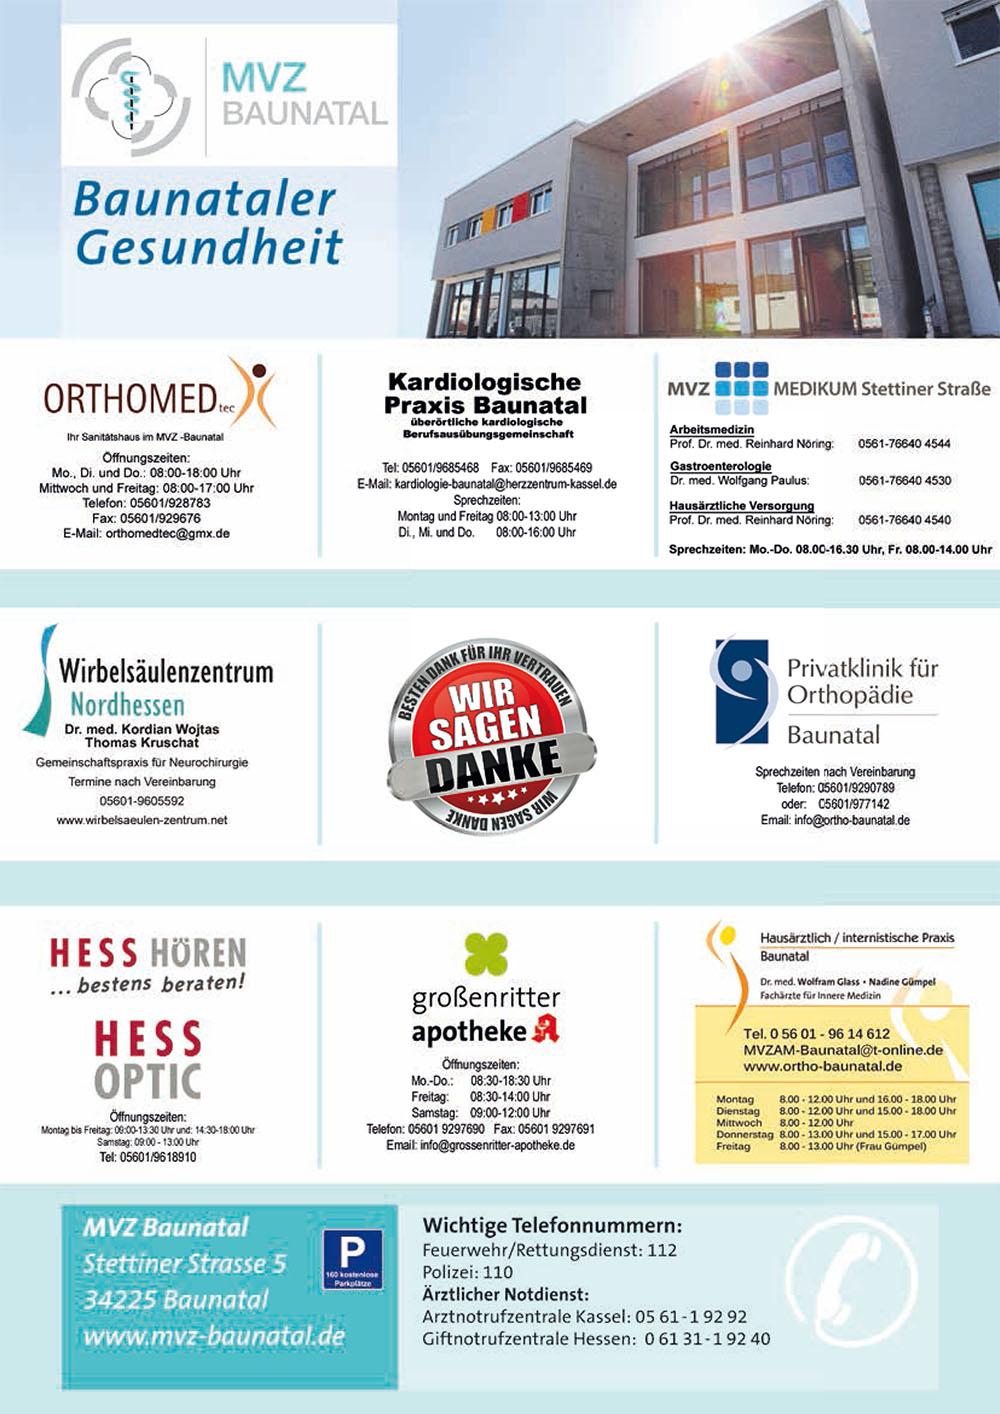 http://www.apotheken.de/fileadmin/clubarea/00000-Angebote/34225_grossenritter_angebot_2.jpg